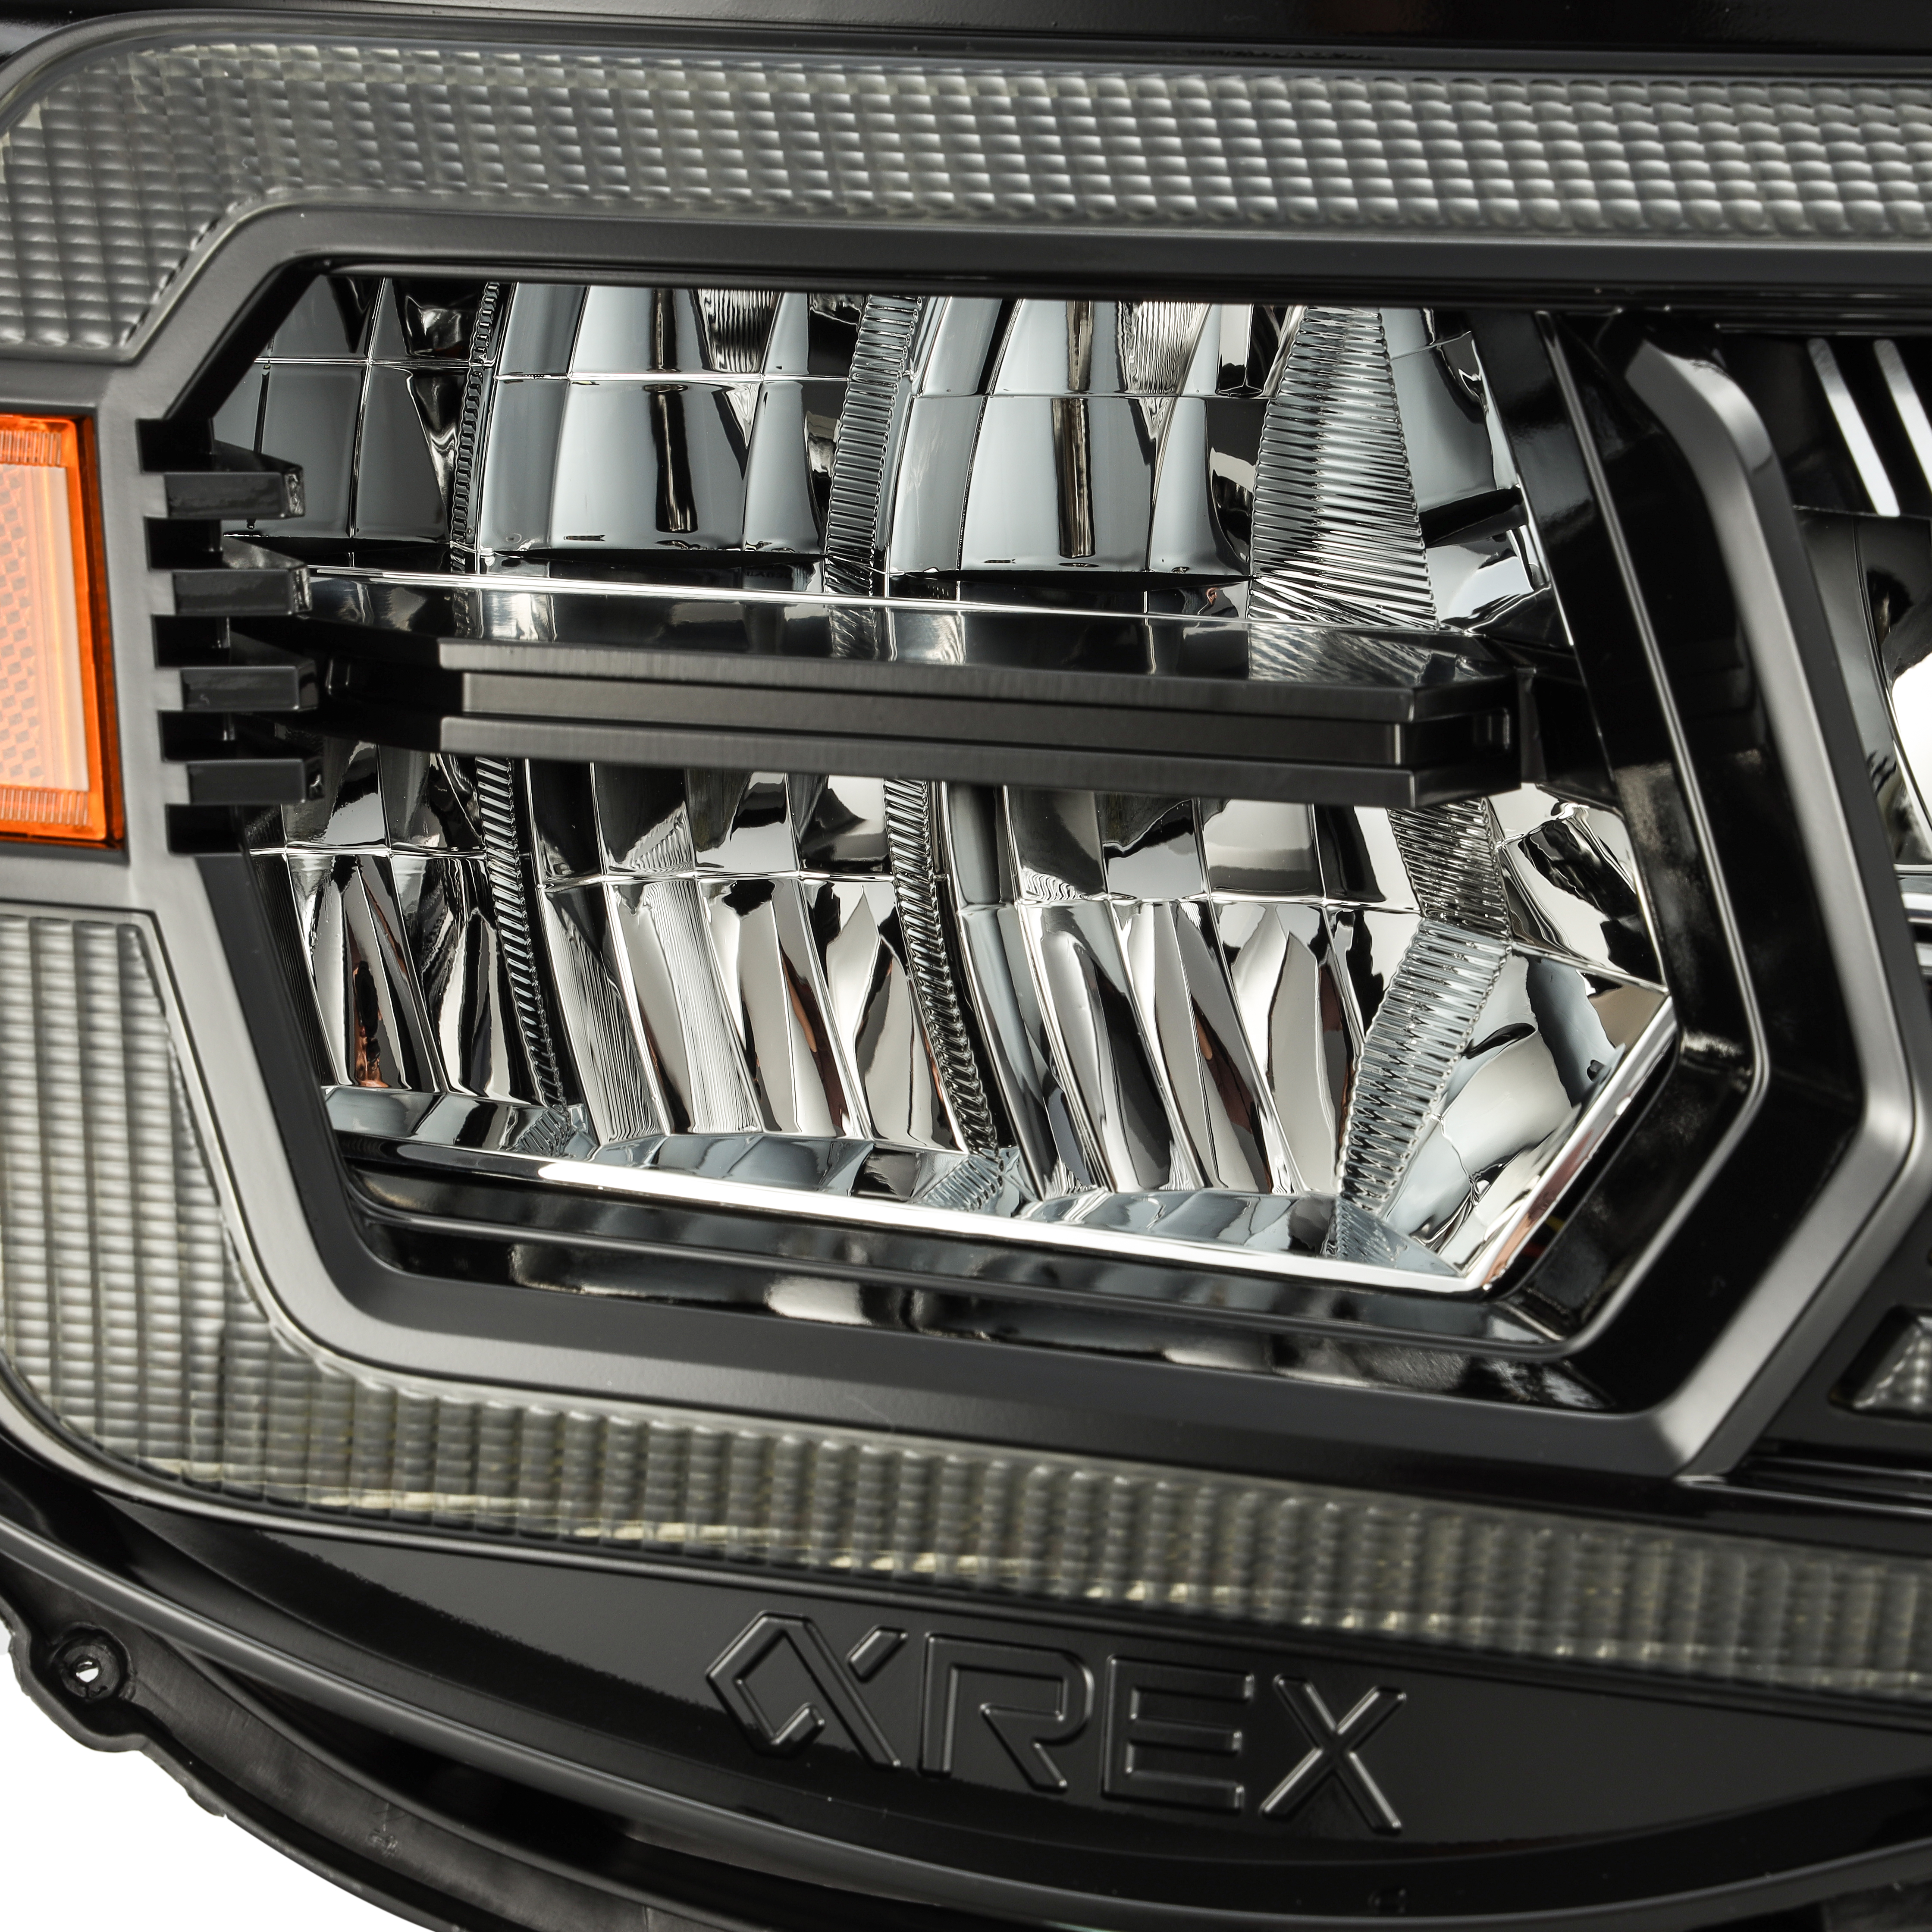 2005 2006 2007 2008 2009 2011 Toyota Tacoma LUXX-Series LED Crystal Headlights Alpha-Black